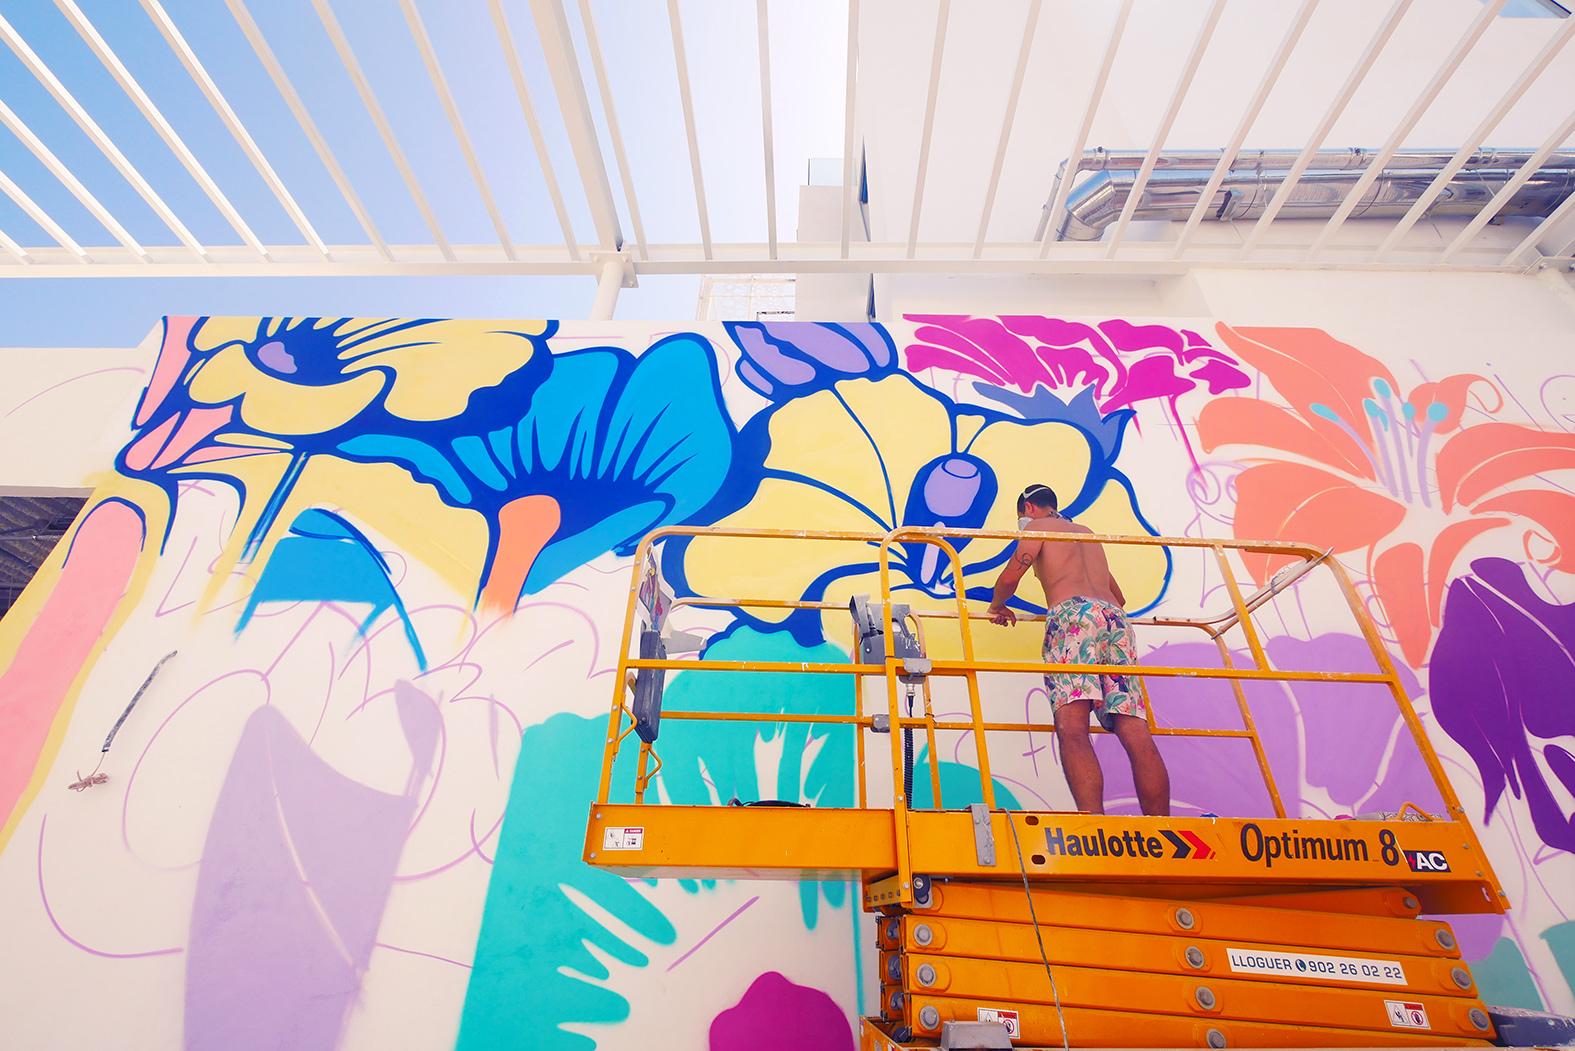 Nerone-W-hotel-painting-street-art-ibiza-1